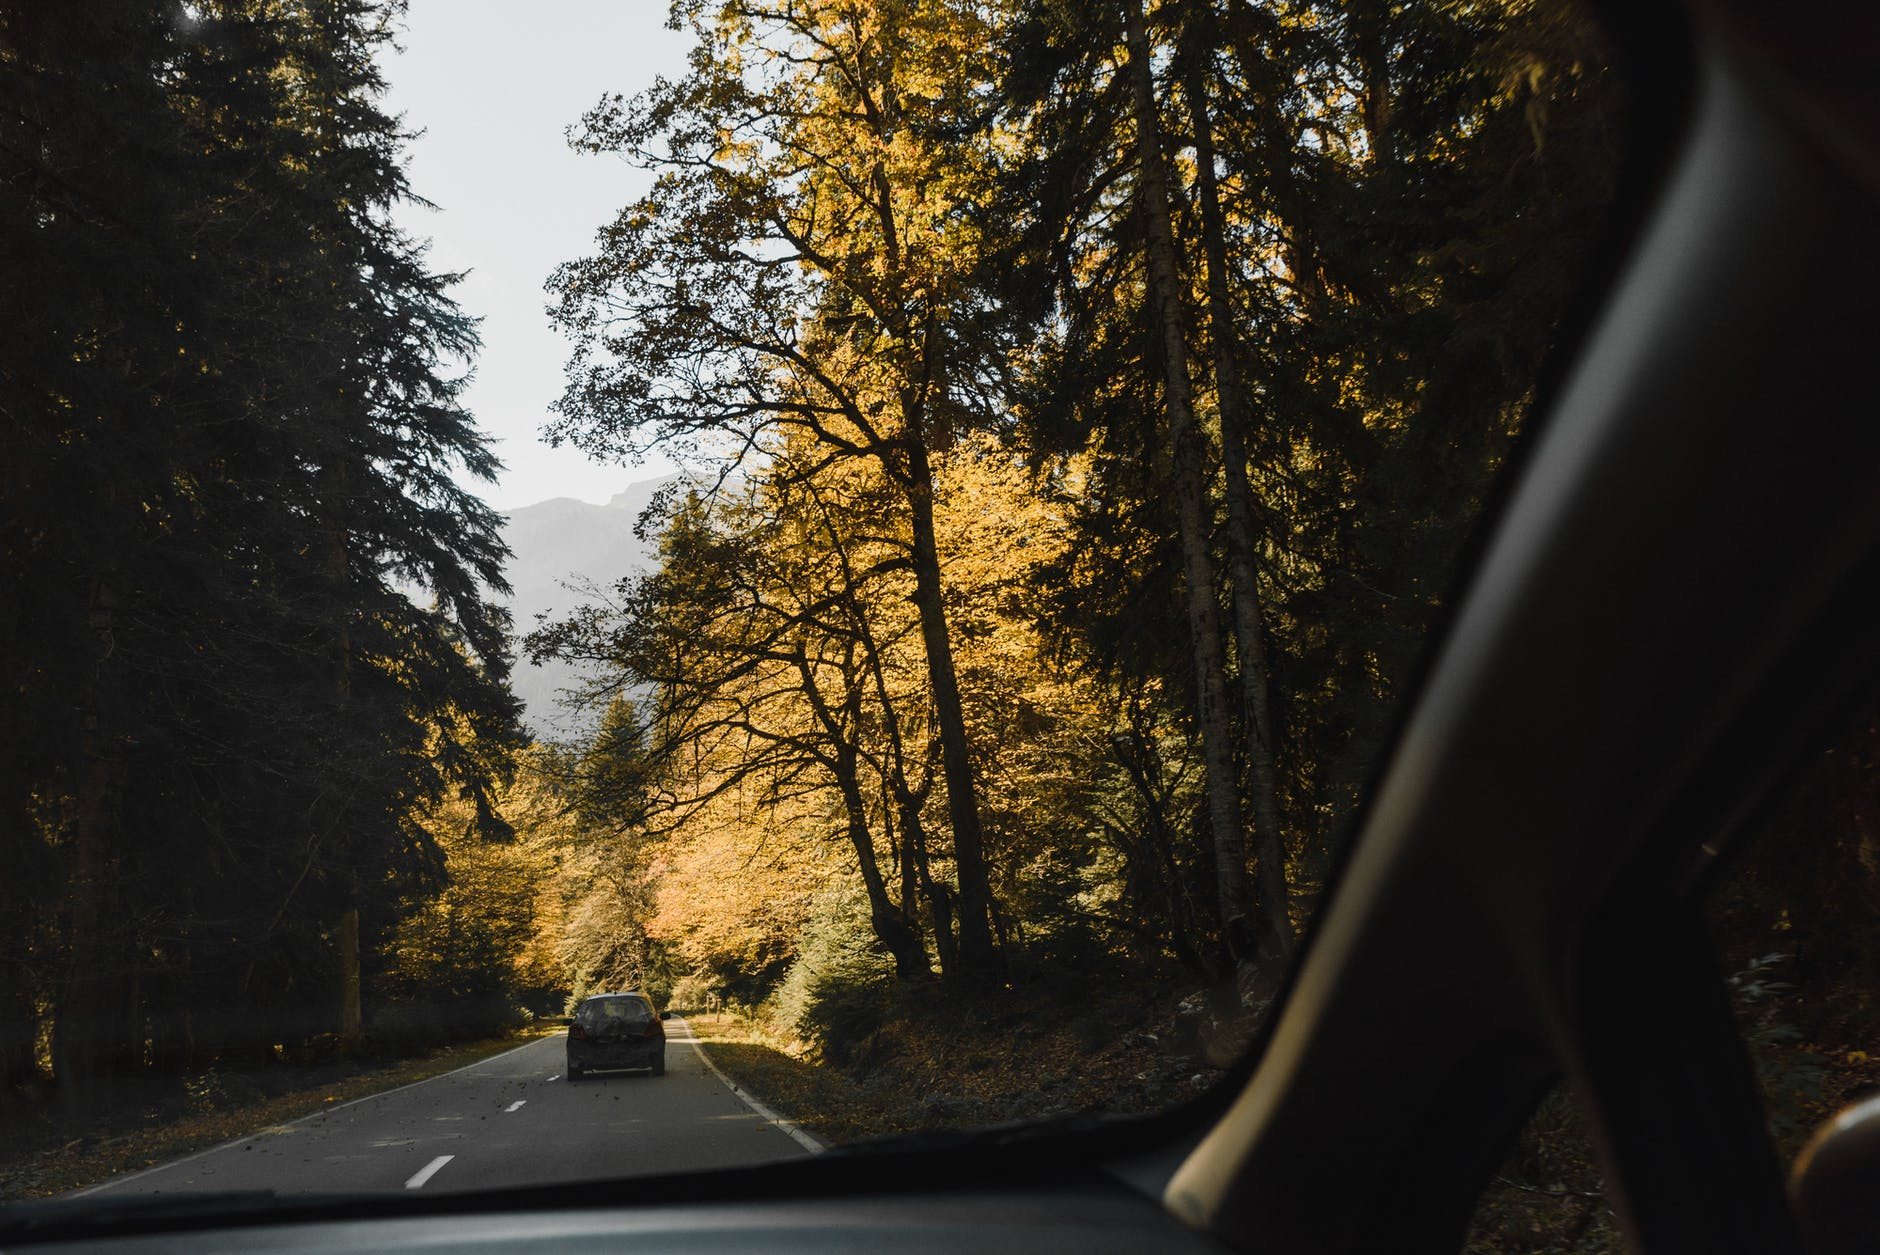 Saldi Europcar con sconti 25%